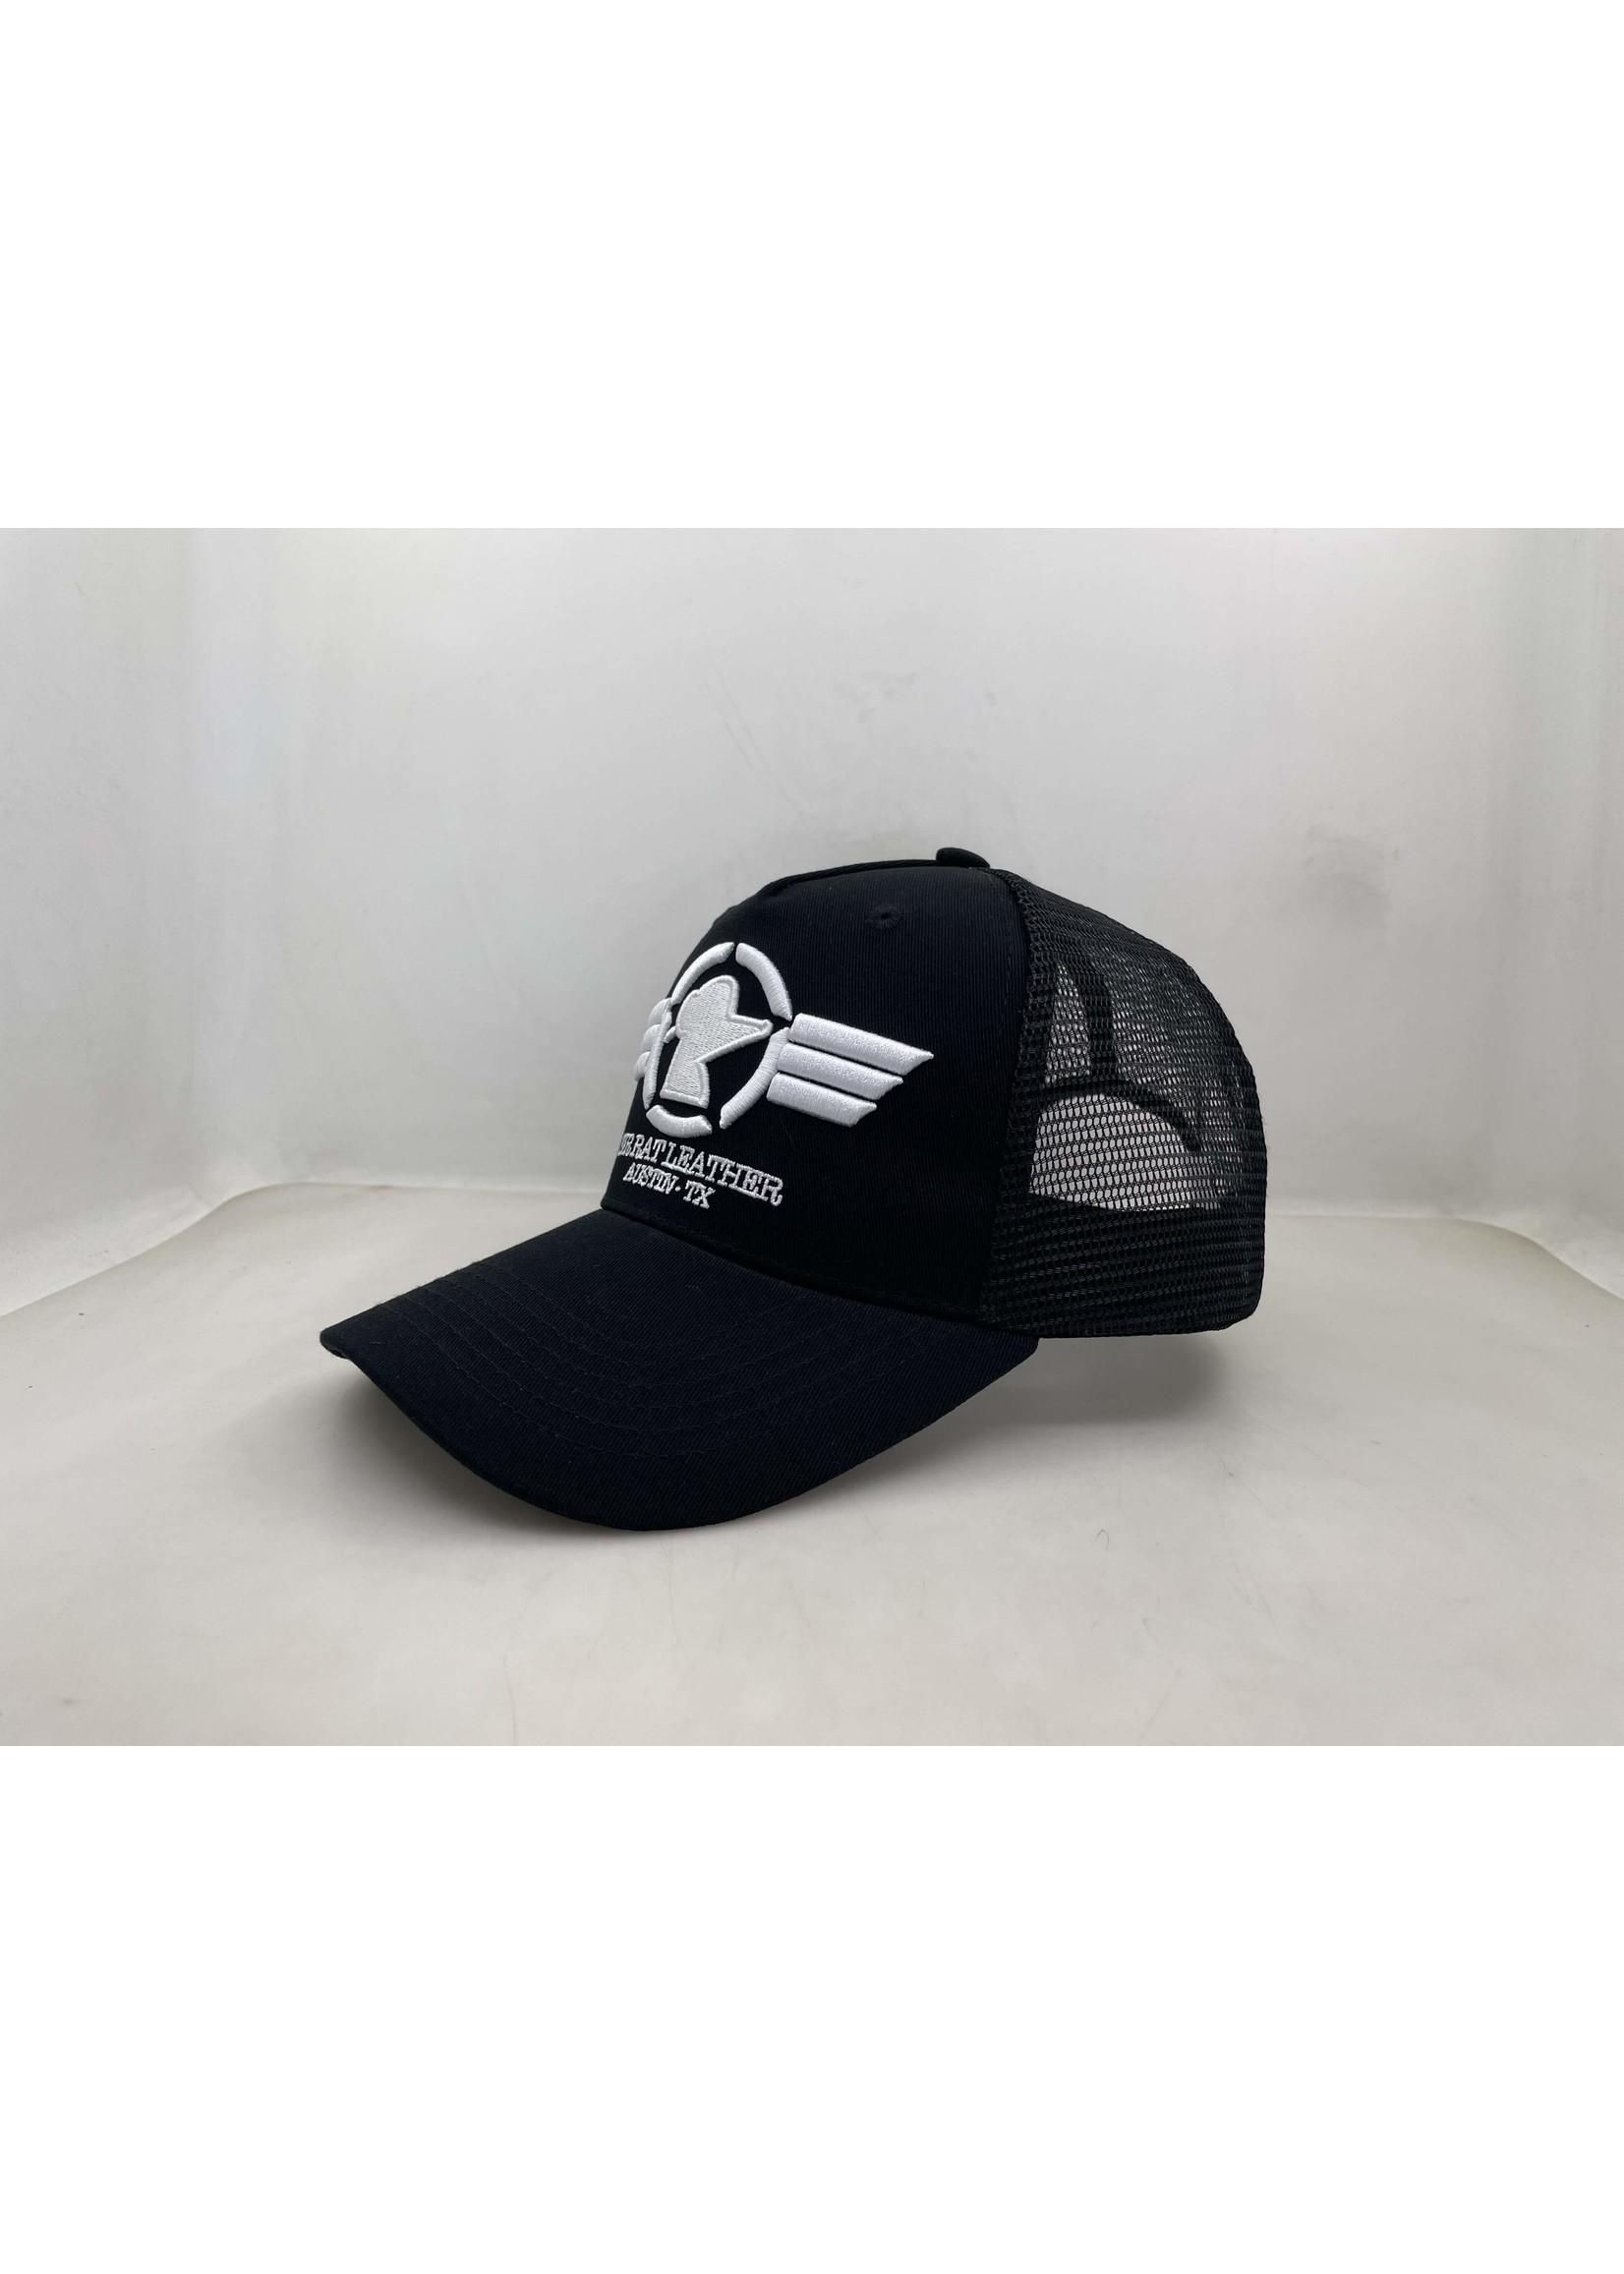 Sir Rat Sir Rat Military Trucker Cap